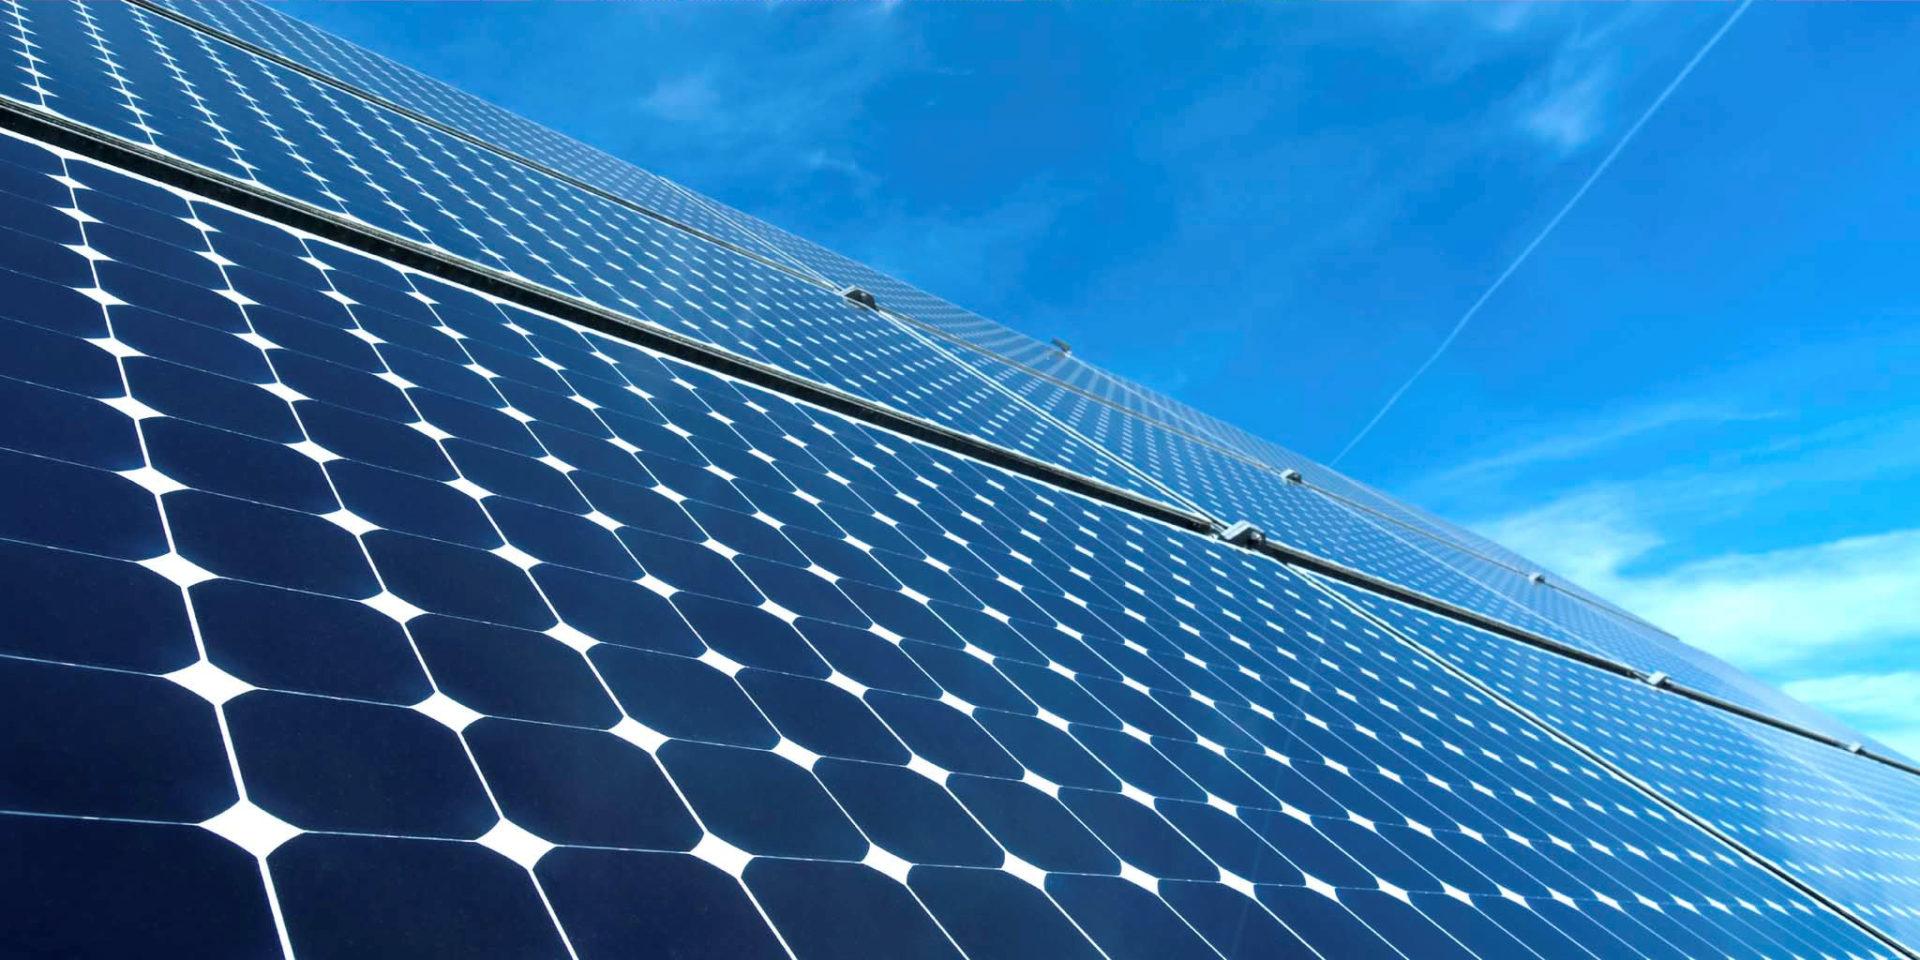 Clean Renewable Solar Energy